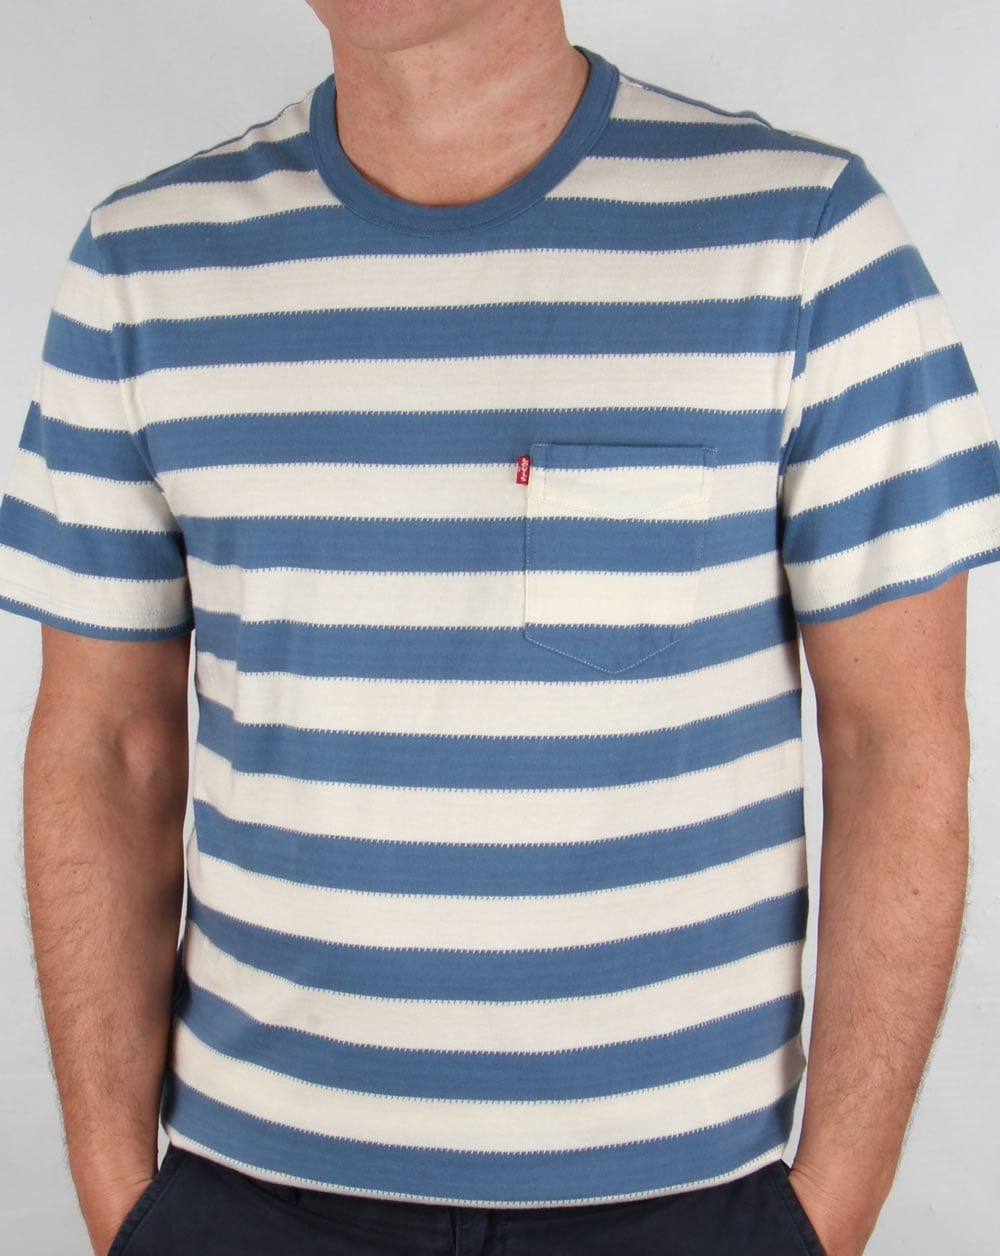 Levis Sunset Pocket Striped T Shirt Blue Chalk Mens Cotton